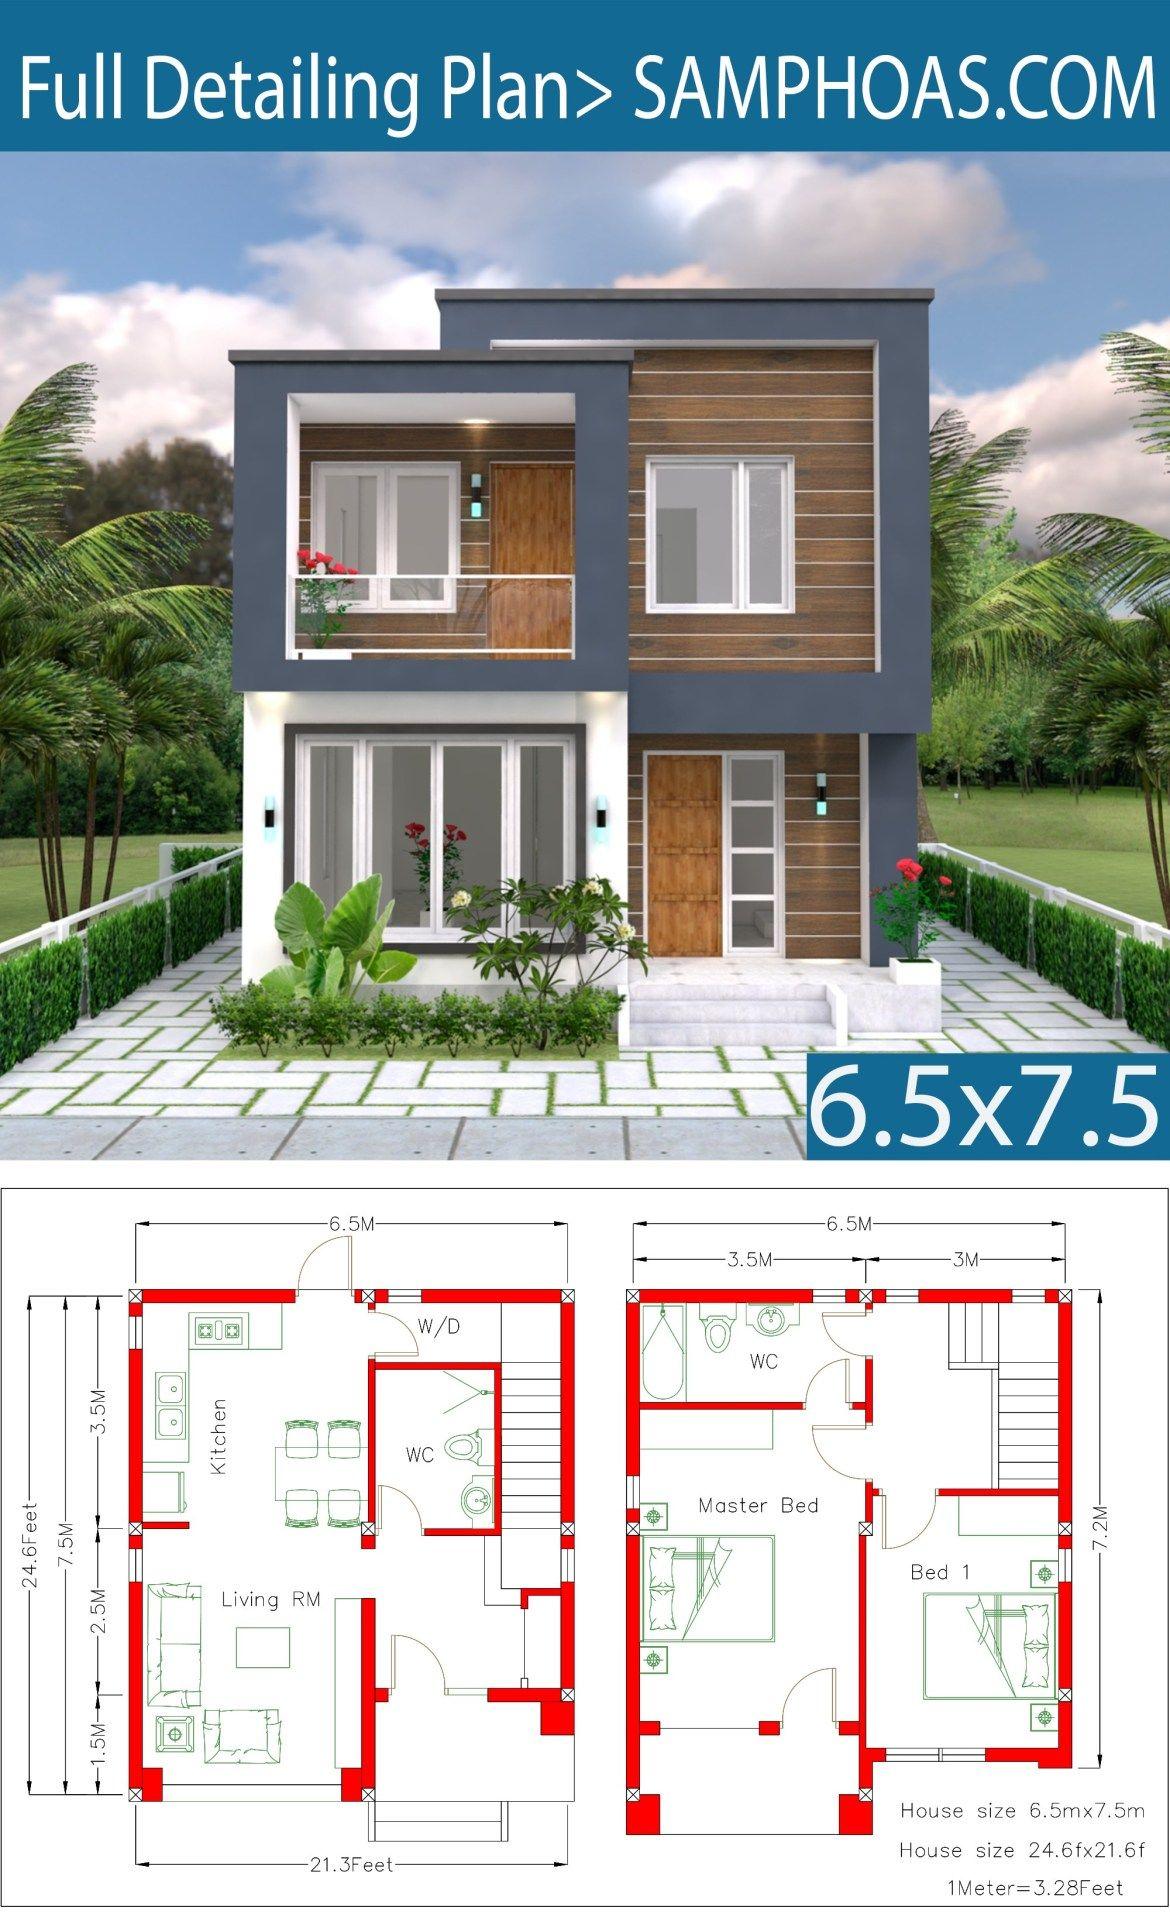 Home Design Plan 6 5x7 5m 2 Bedrooms Samphoas Plansearch Small House Design Plans Small House Design House Designs Exterior